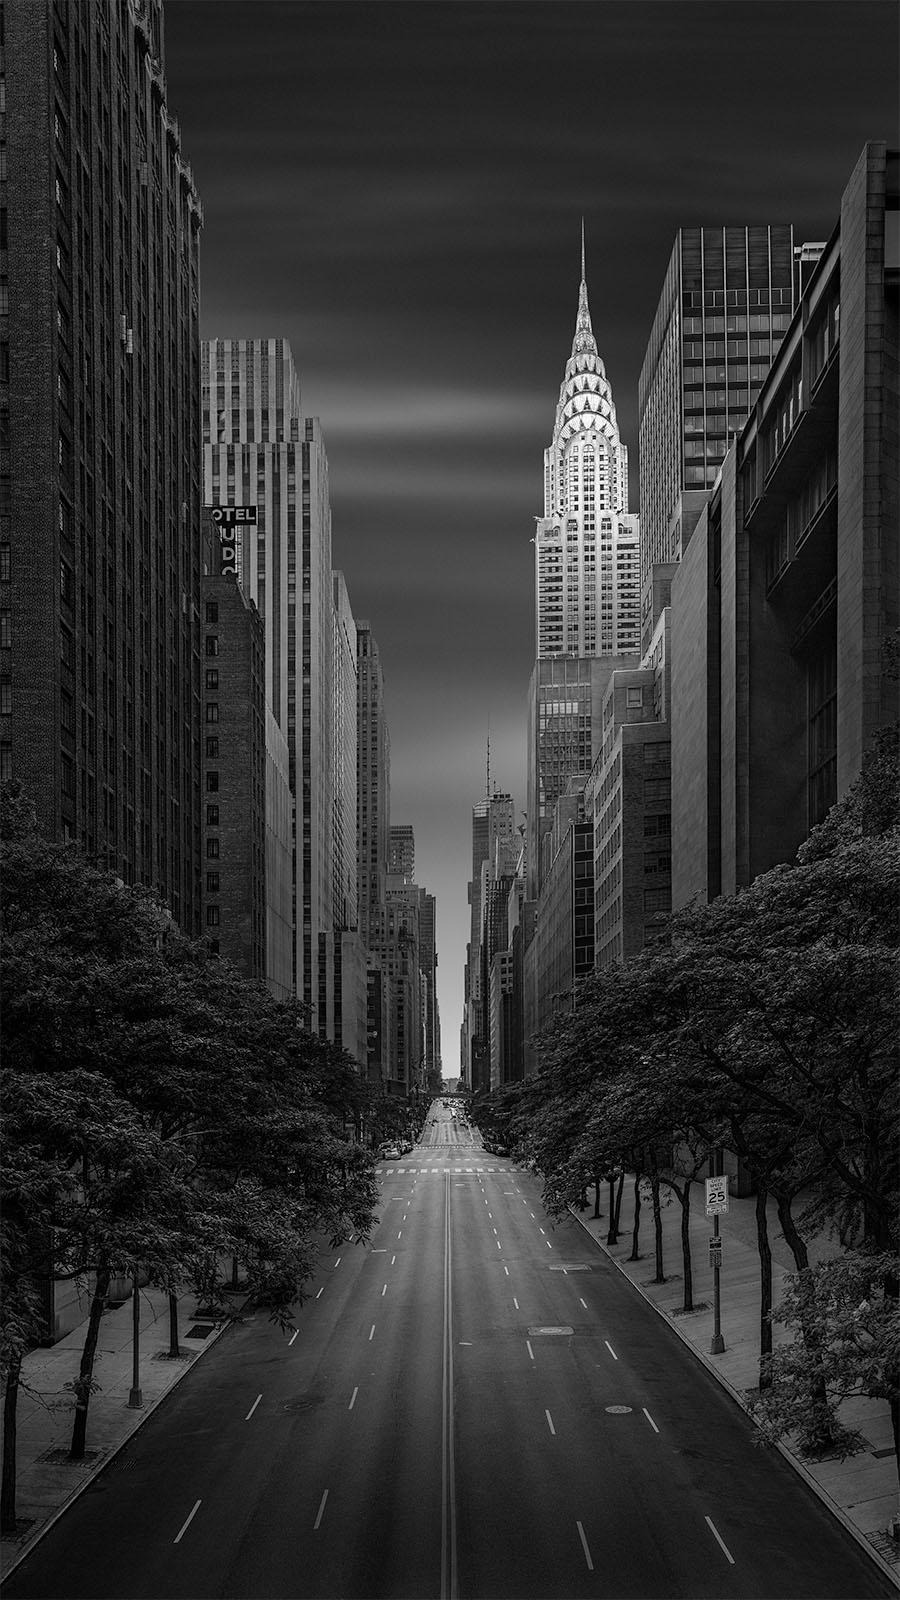 Dali's Distant Dream - Chrysler Building New York © Julia Anna Gospodarou